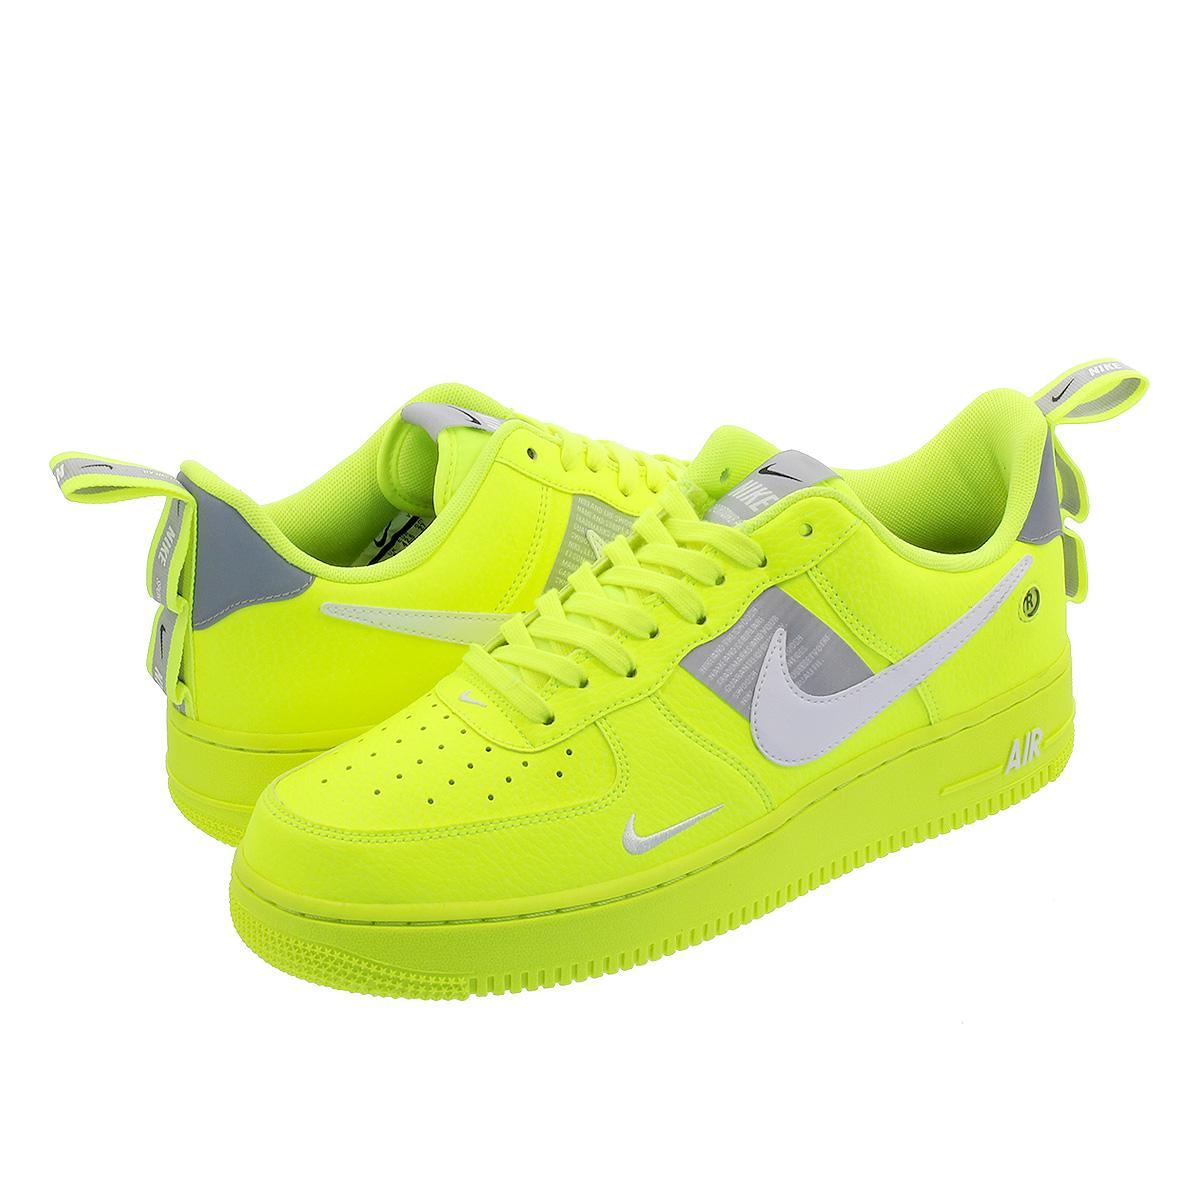 Nike Air Force 1 Utility Volt AJ7747 700 Mens Womens Running Shoes aj7747 700